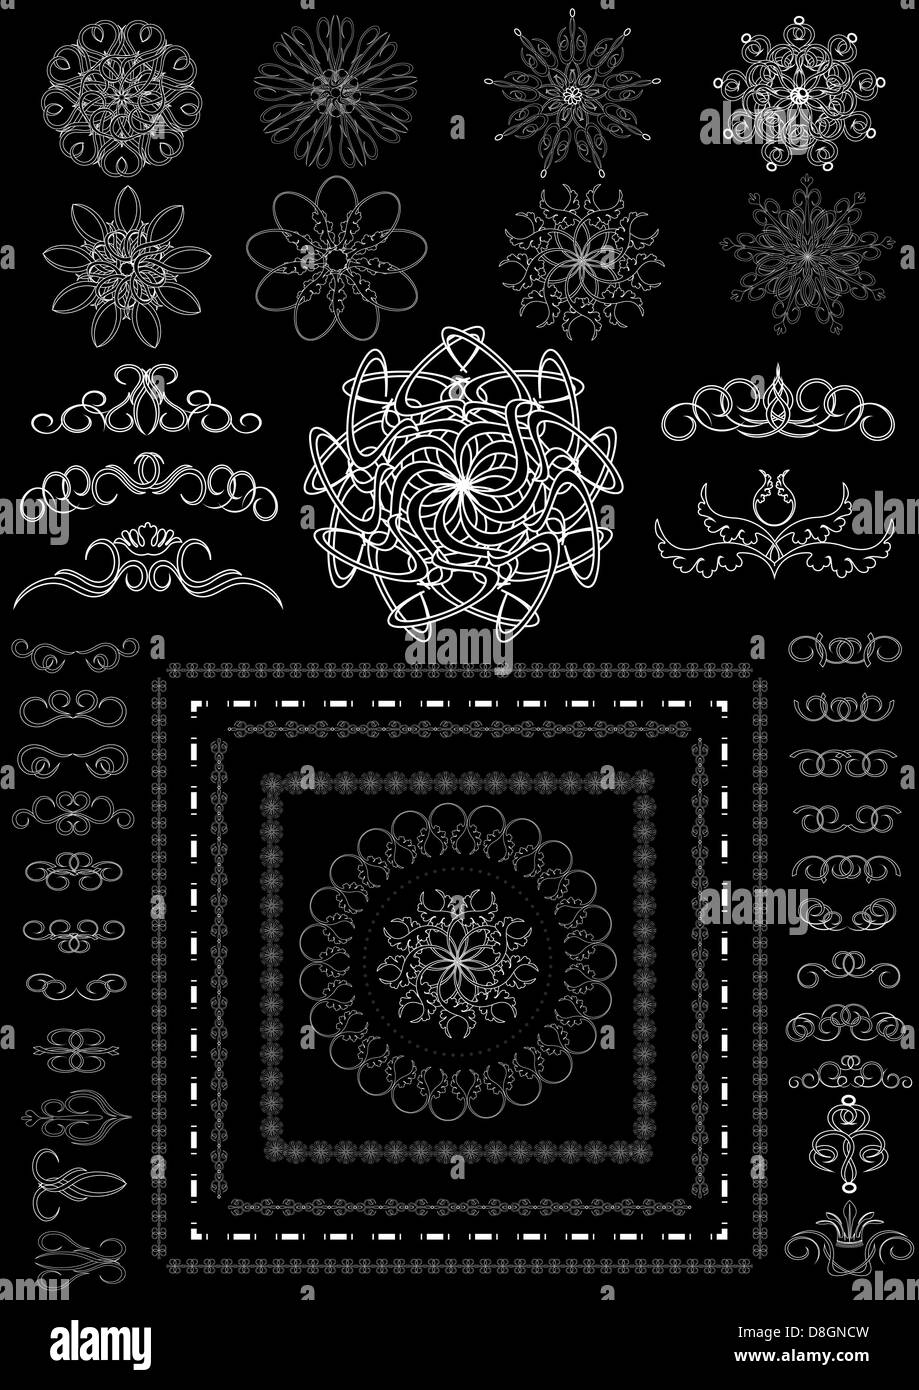 Version decorative calligraphic brush - Stock Image